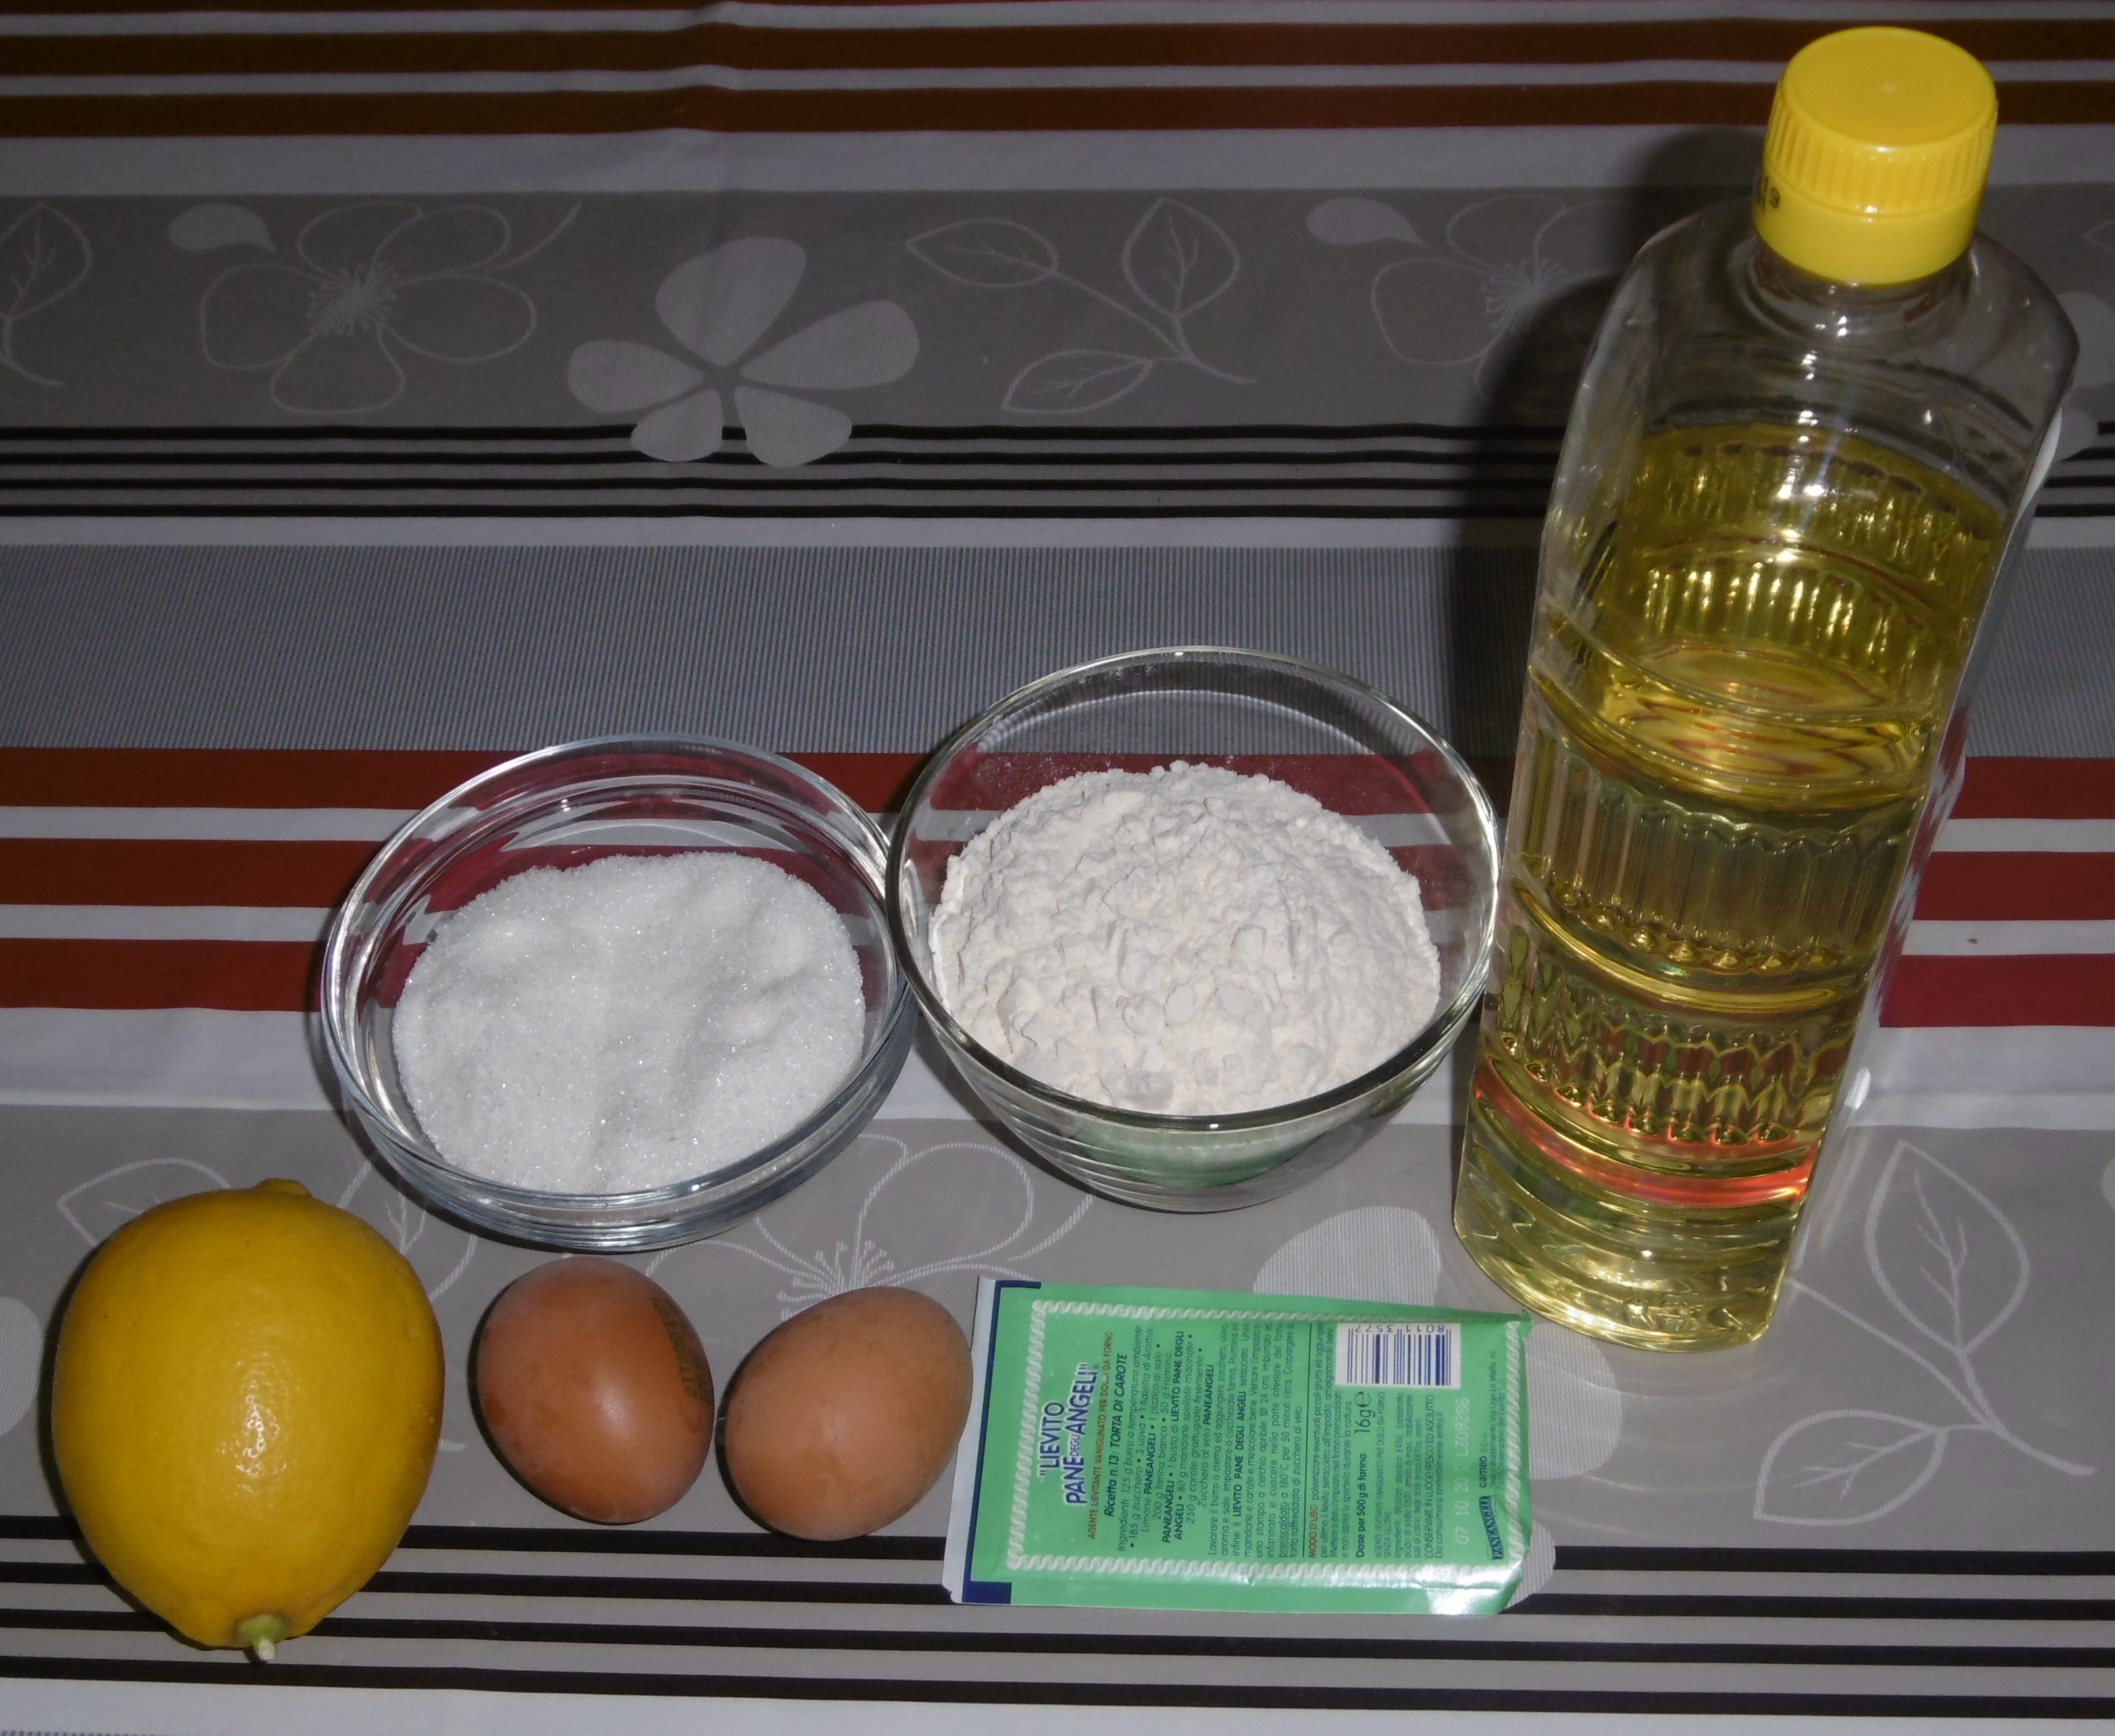 Pasta frolla senza burro - Ingredienti